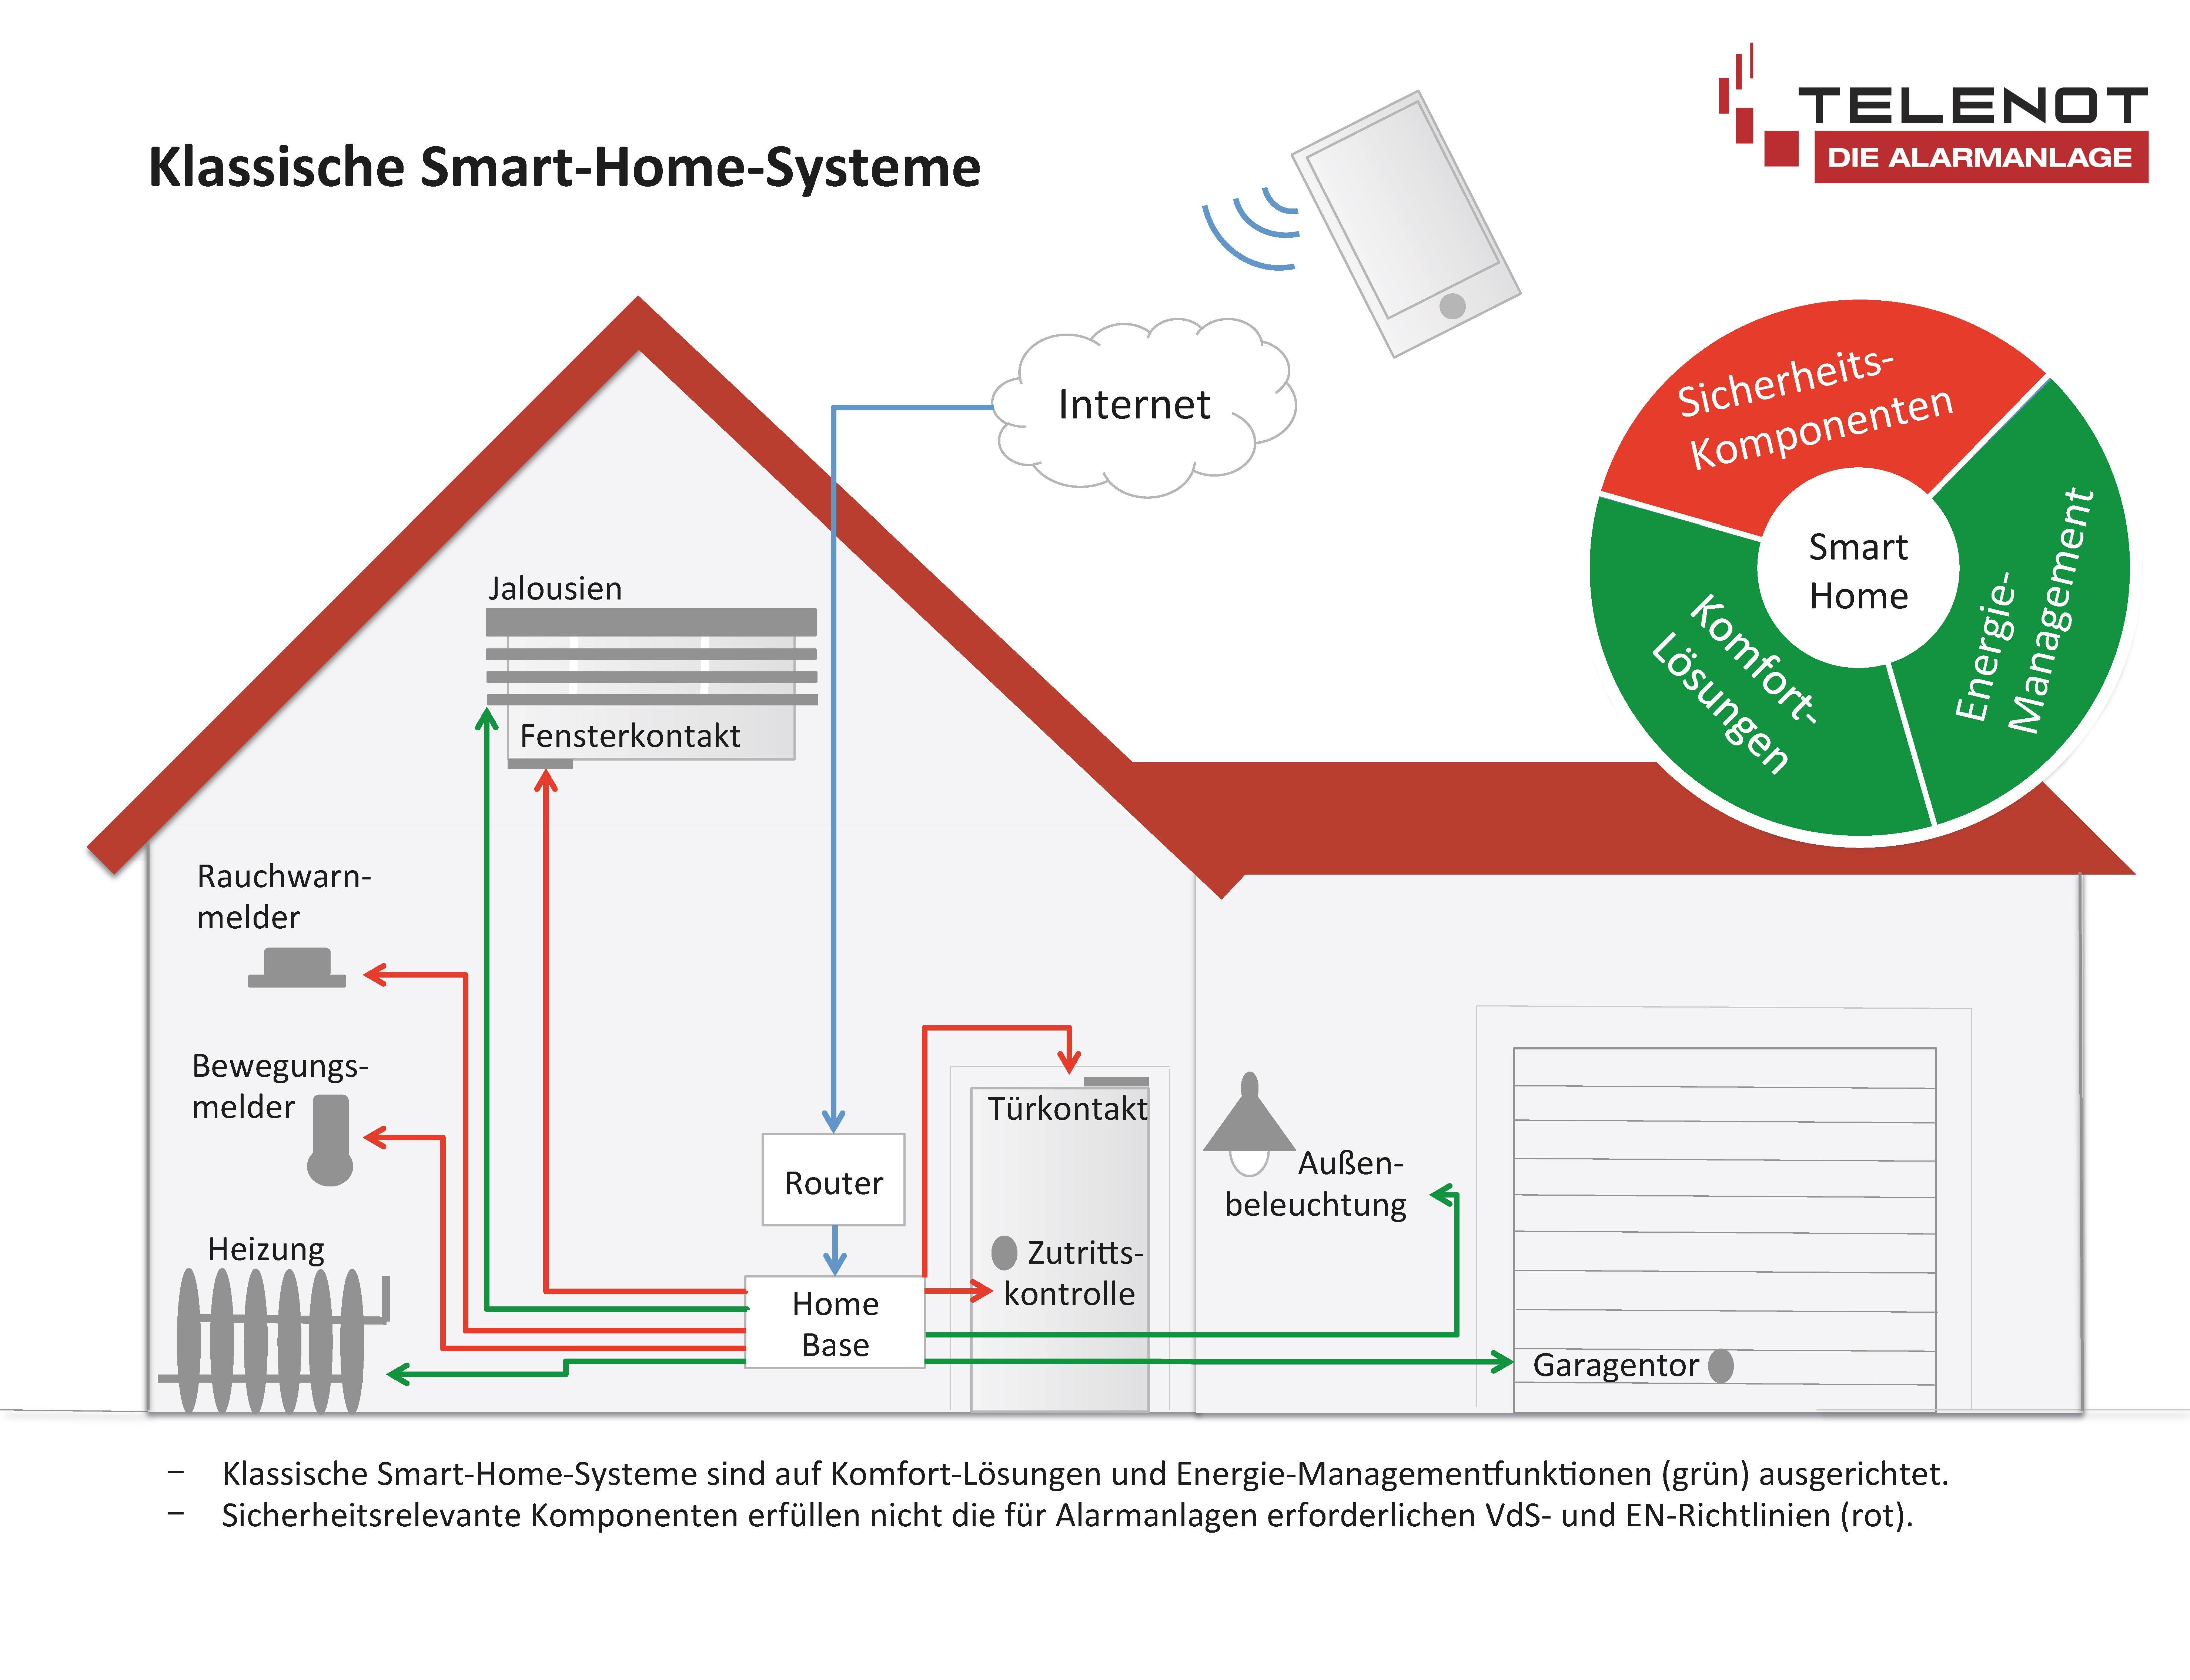 verbraucherfalle smart home systeme sind unzuverl ssig. Black Bedroom Furniture Sets. Home Design Ideas